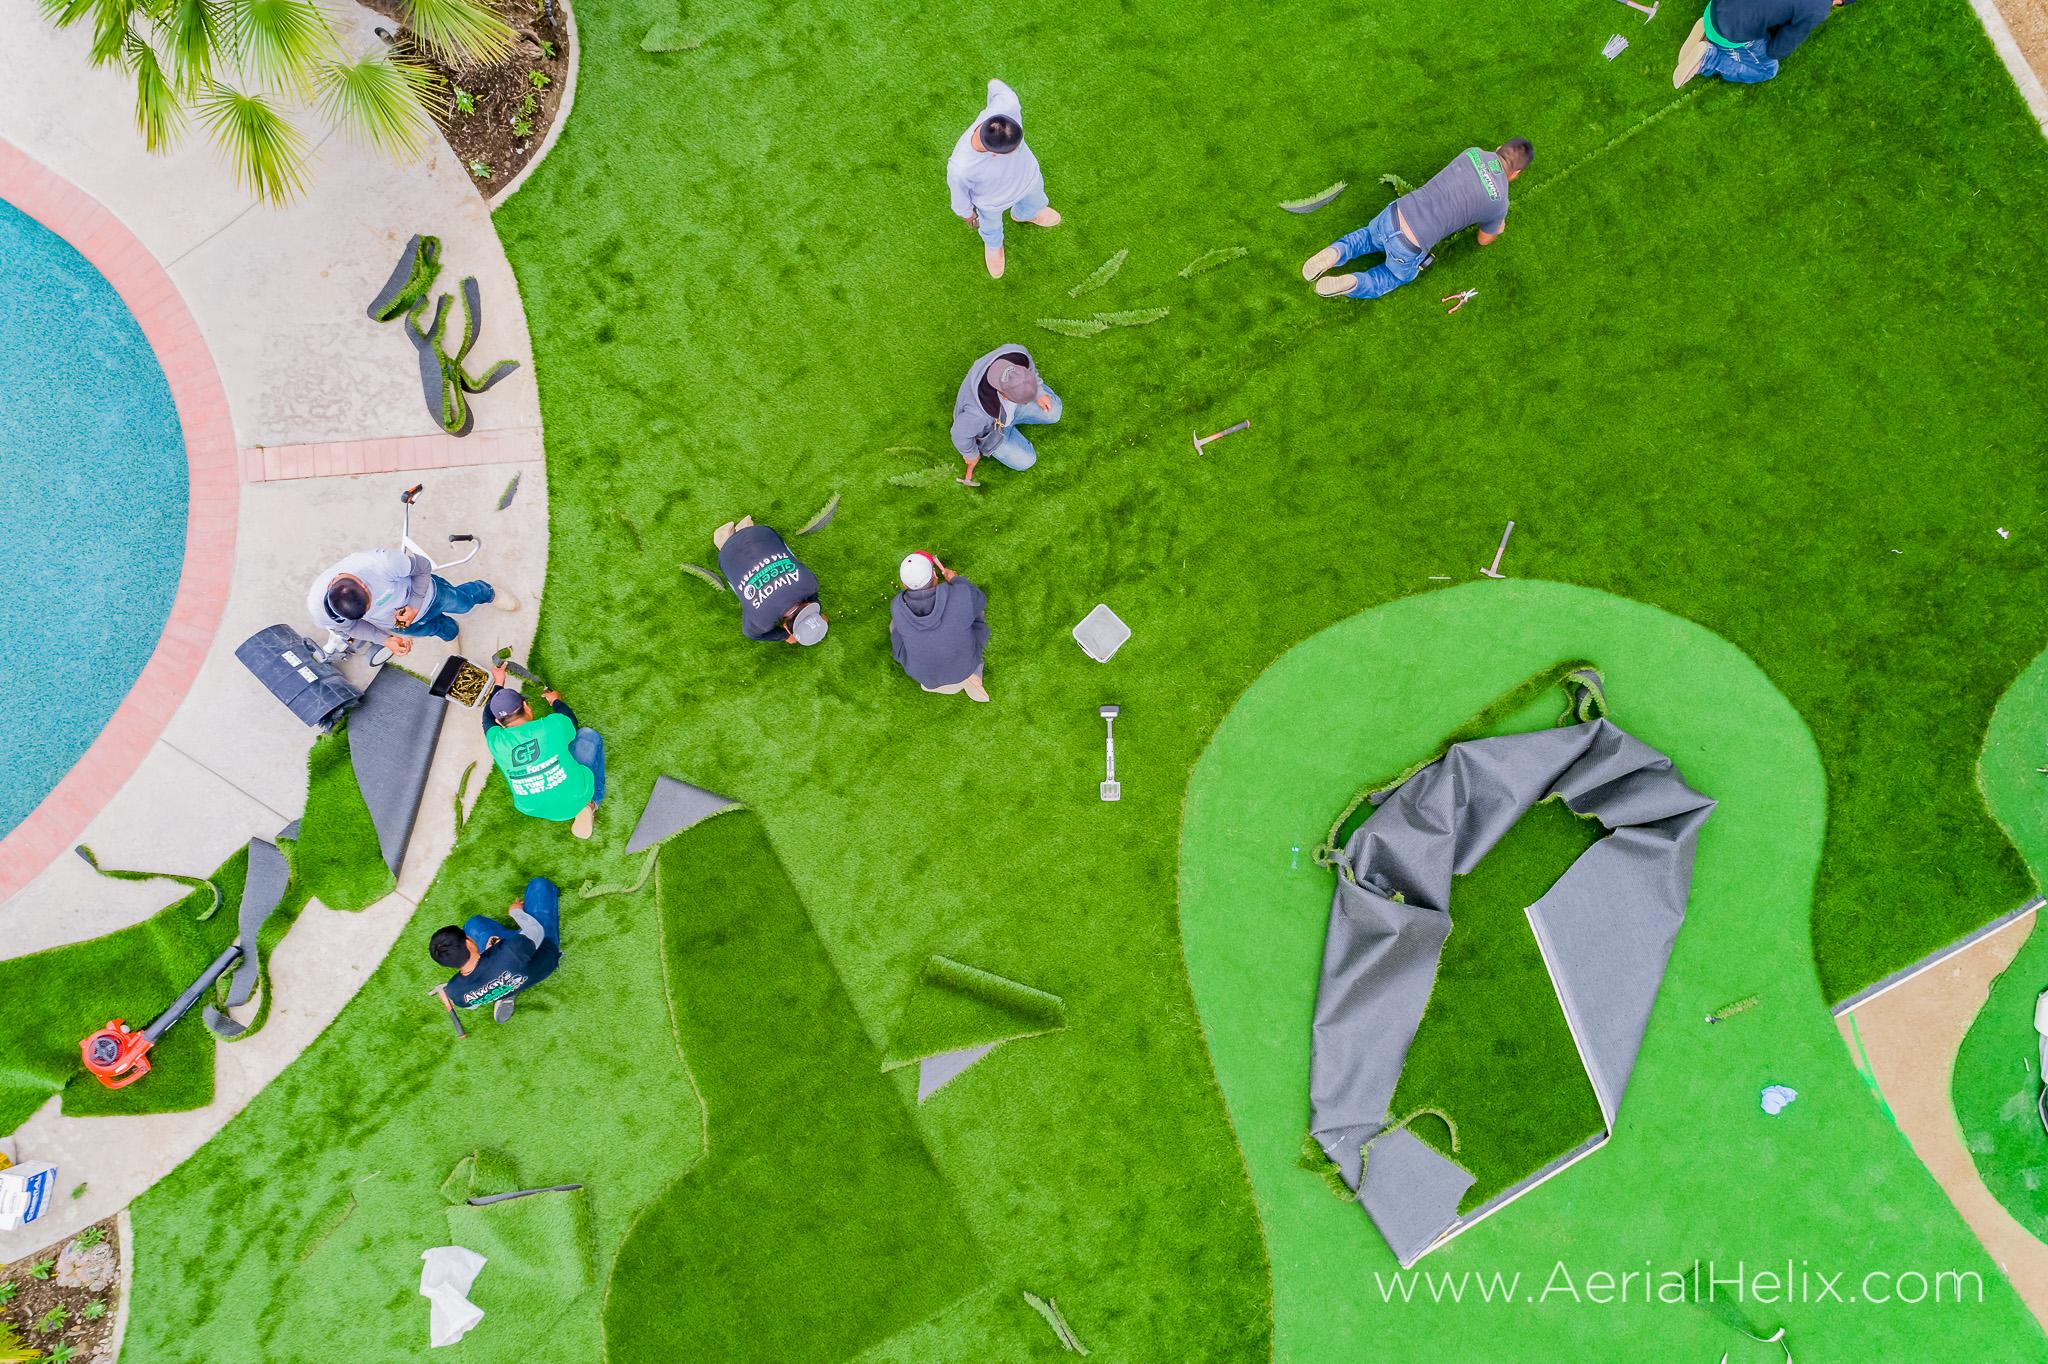 Joe Grass Install Photos aerial-6.jpg